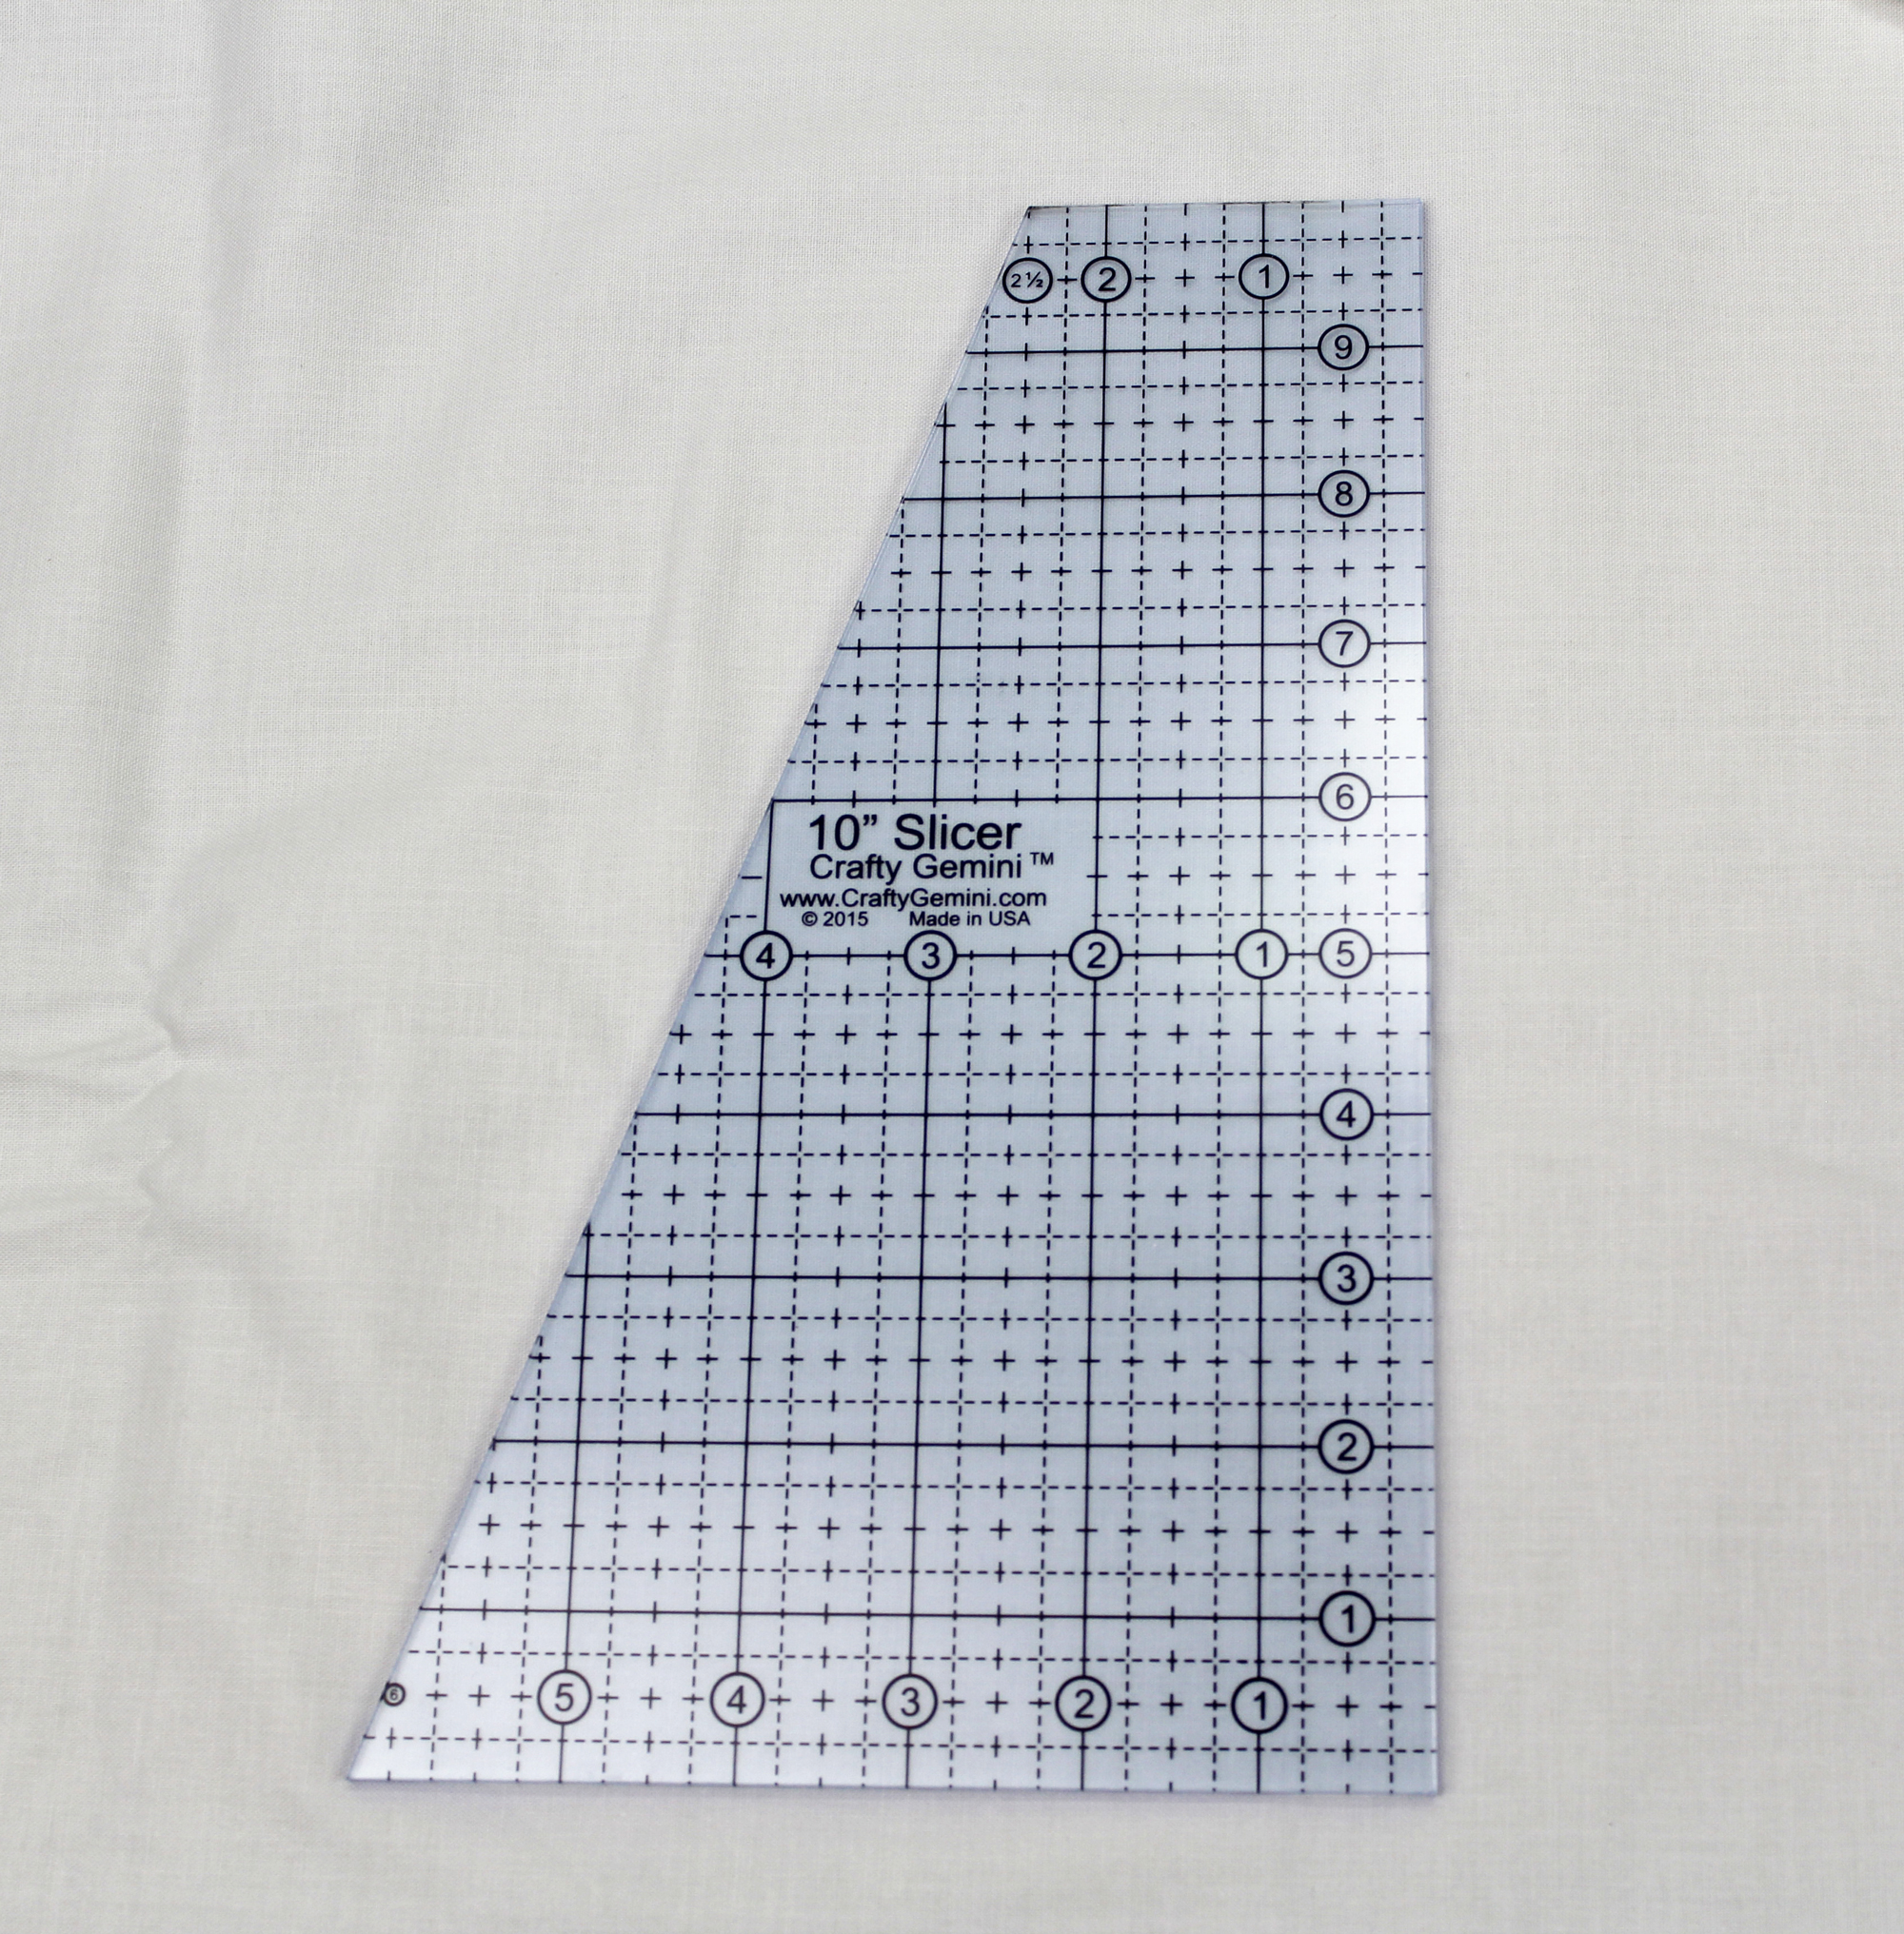 10 Quot Slicer Quilting Ruler Amp Template Crafty Gemini